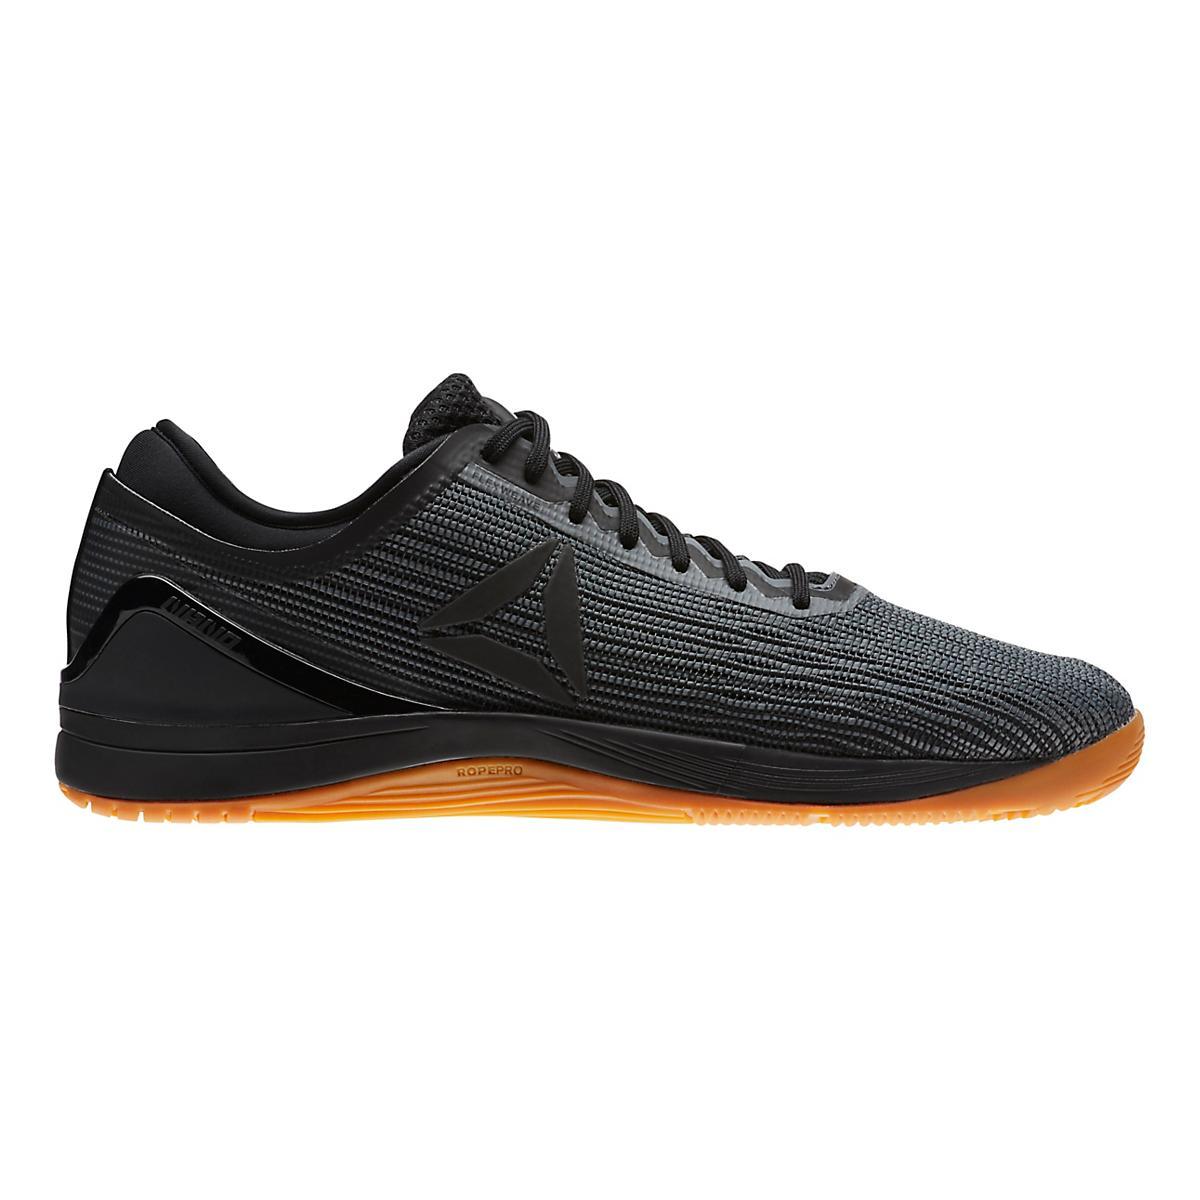 6a4fbd9889d Mens Reebok CrossFit Nano 8 Flexweave Cross Training Shoe at Road Runner  Sports